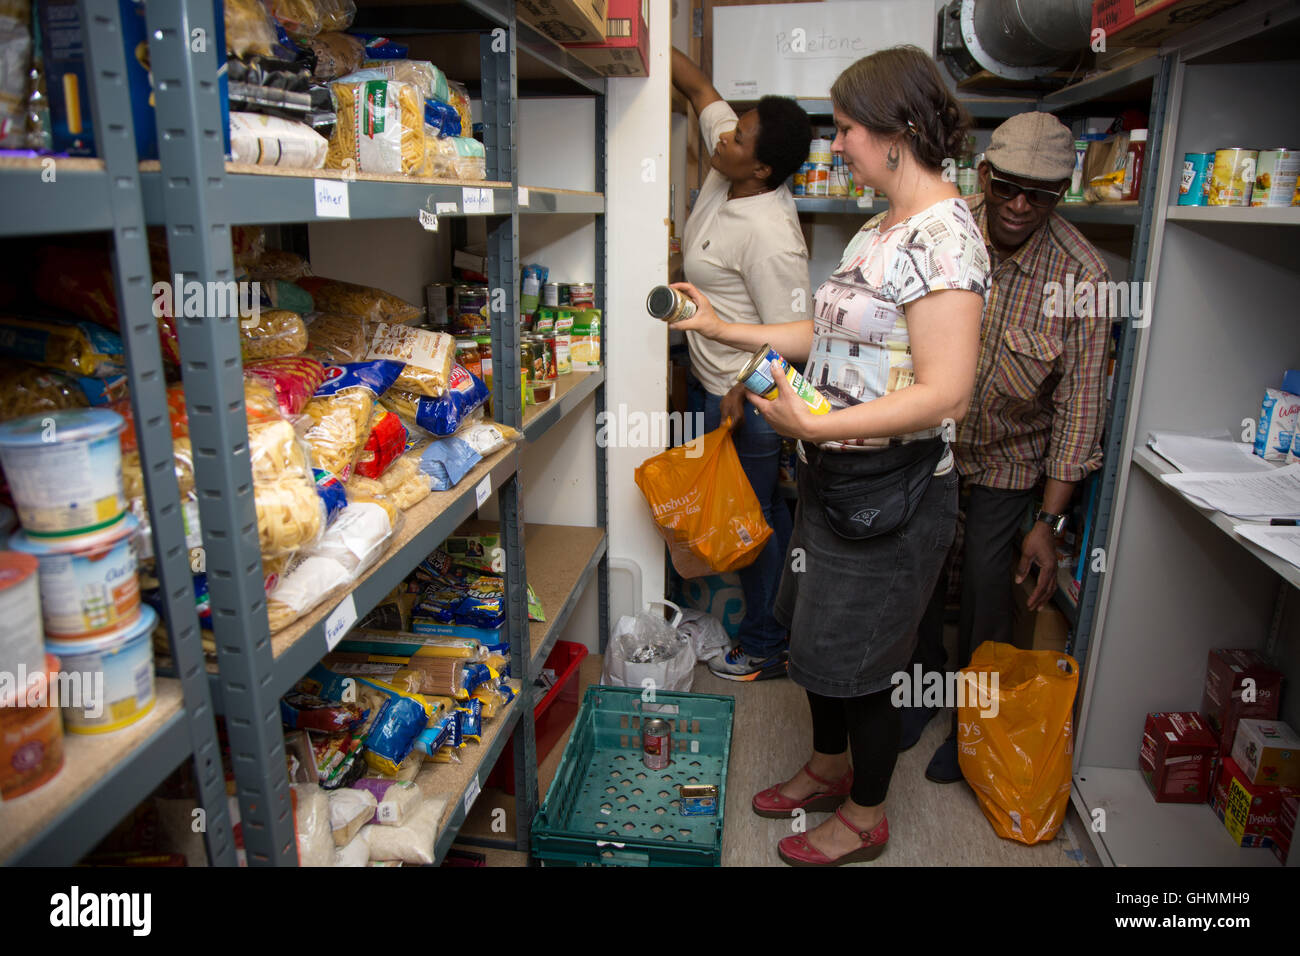 Volunteers stock shelves at North Paddington foodbank. - Stock Image